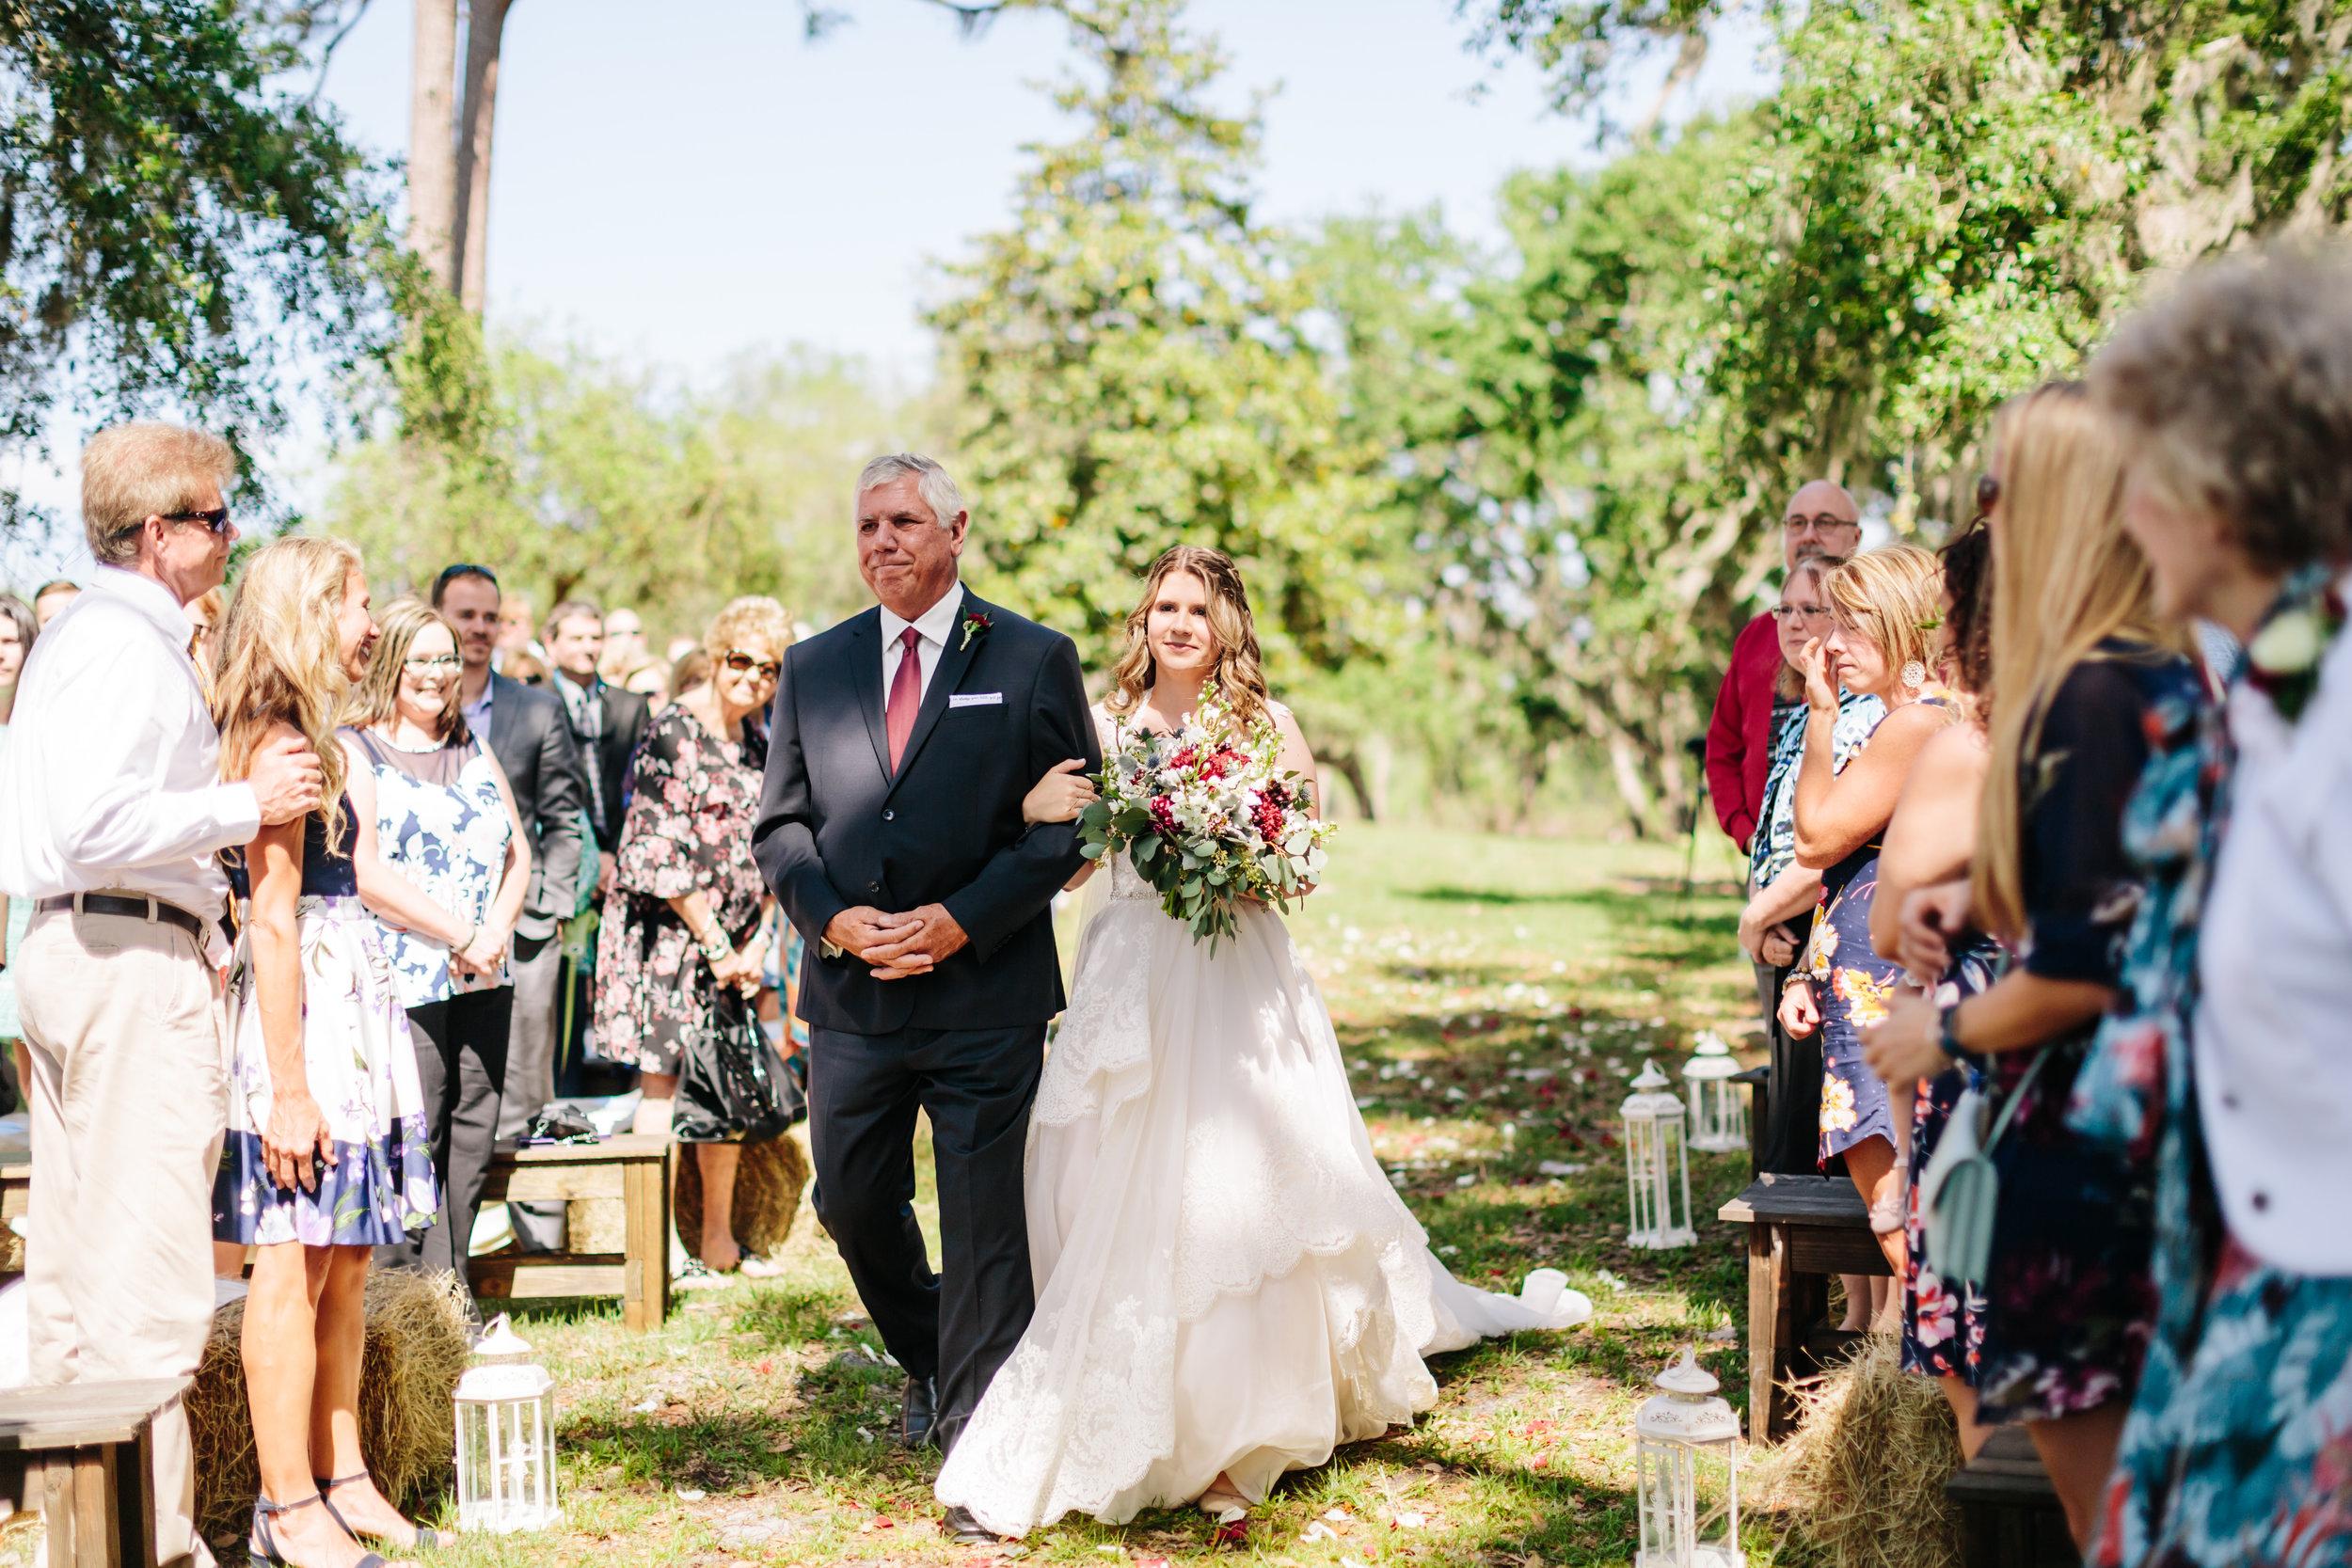 2018.04.14 Zak and Jamisyn Unrue Black Willow Barn Wedding Finals-325.jpg